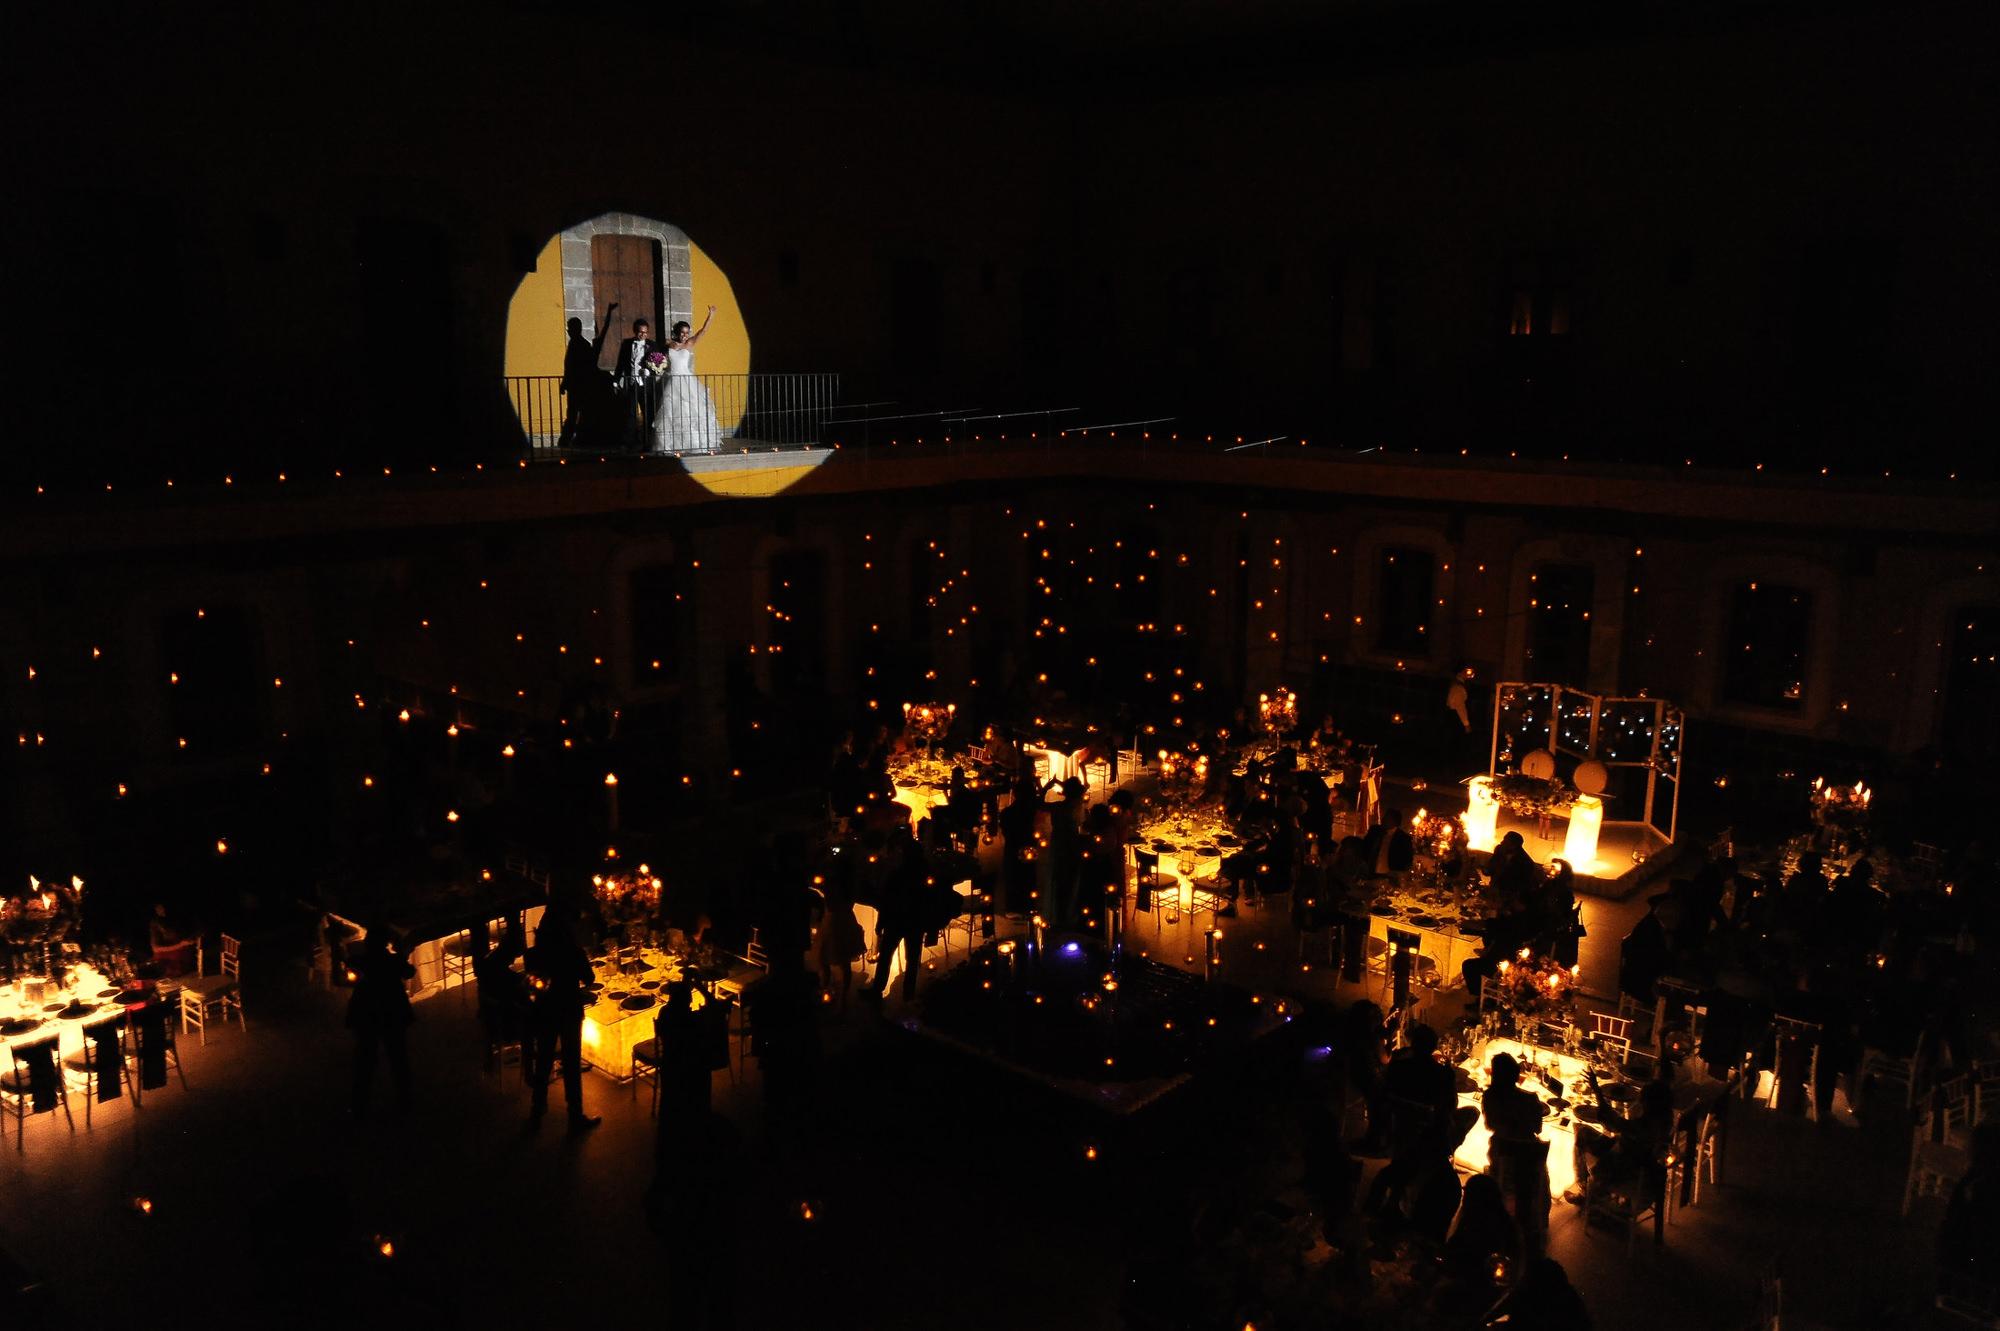 bride-and-groom-in-spotlight-reception-entrance-worlds-best-wedding-photos-daniel-aguilar-houston-wedding-photographers